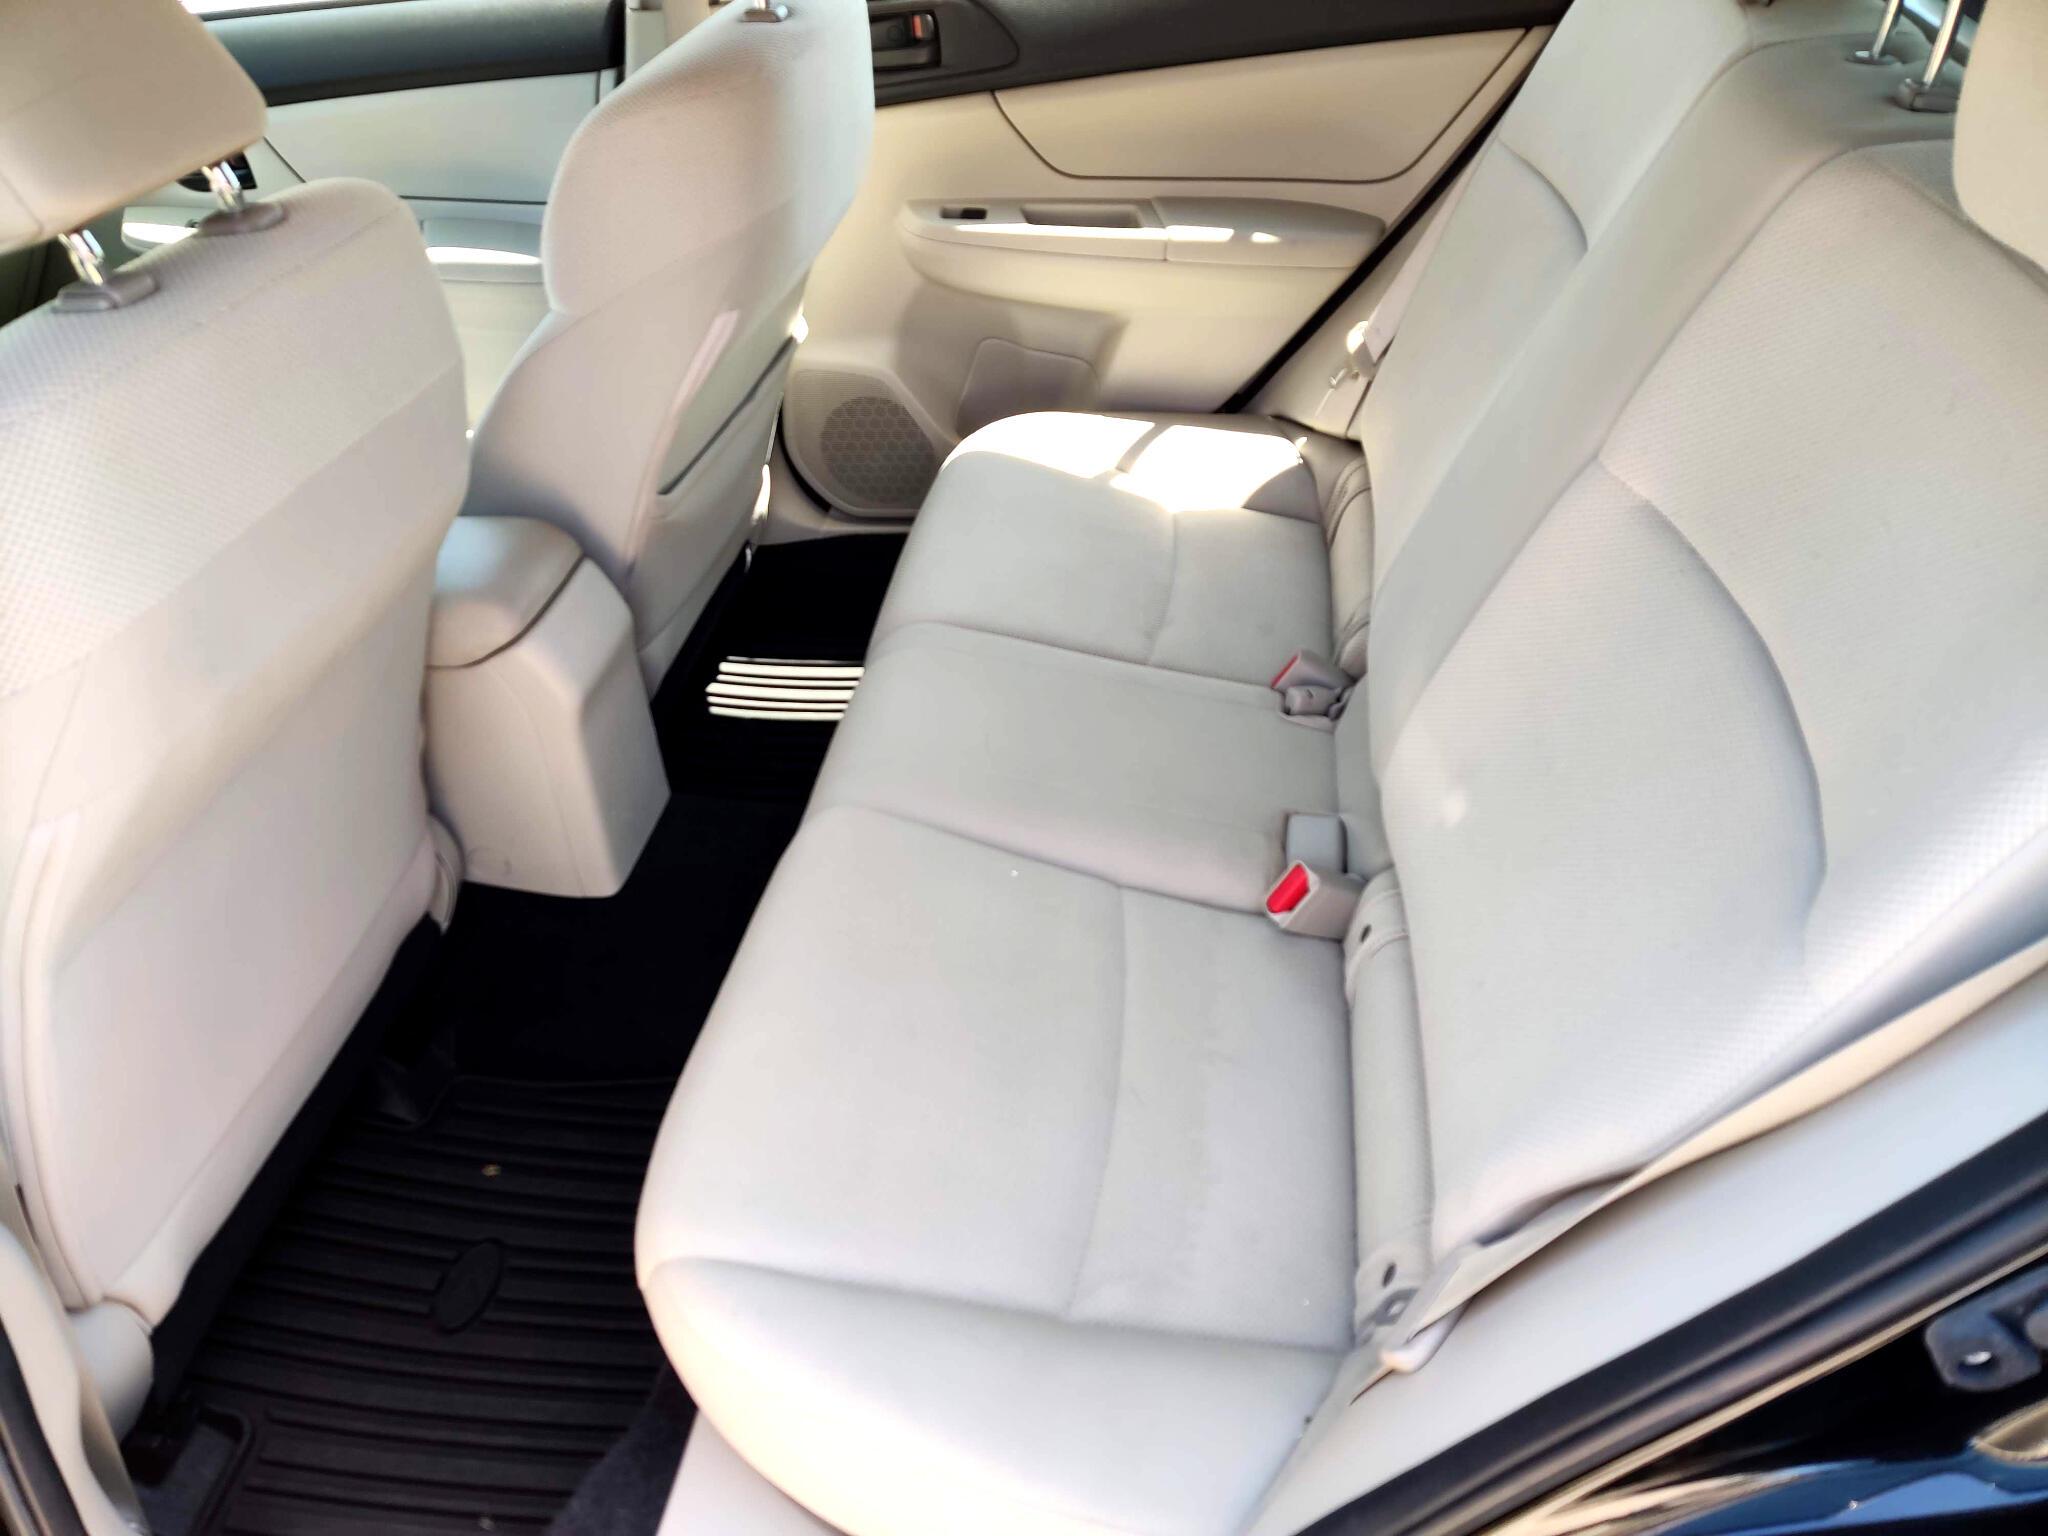 2012 Subaru Impreza Wagon 5dr Man 2.0i